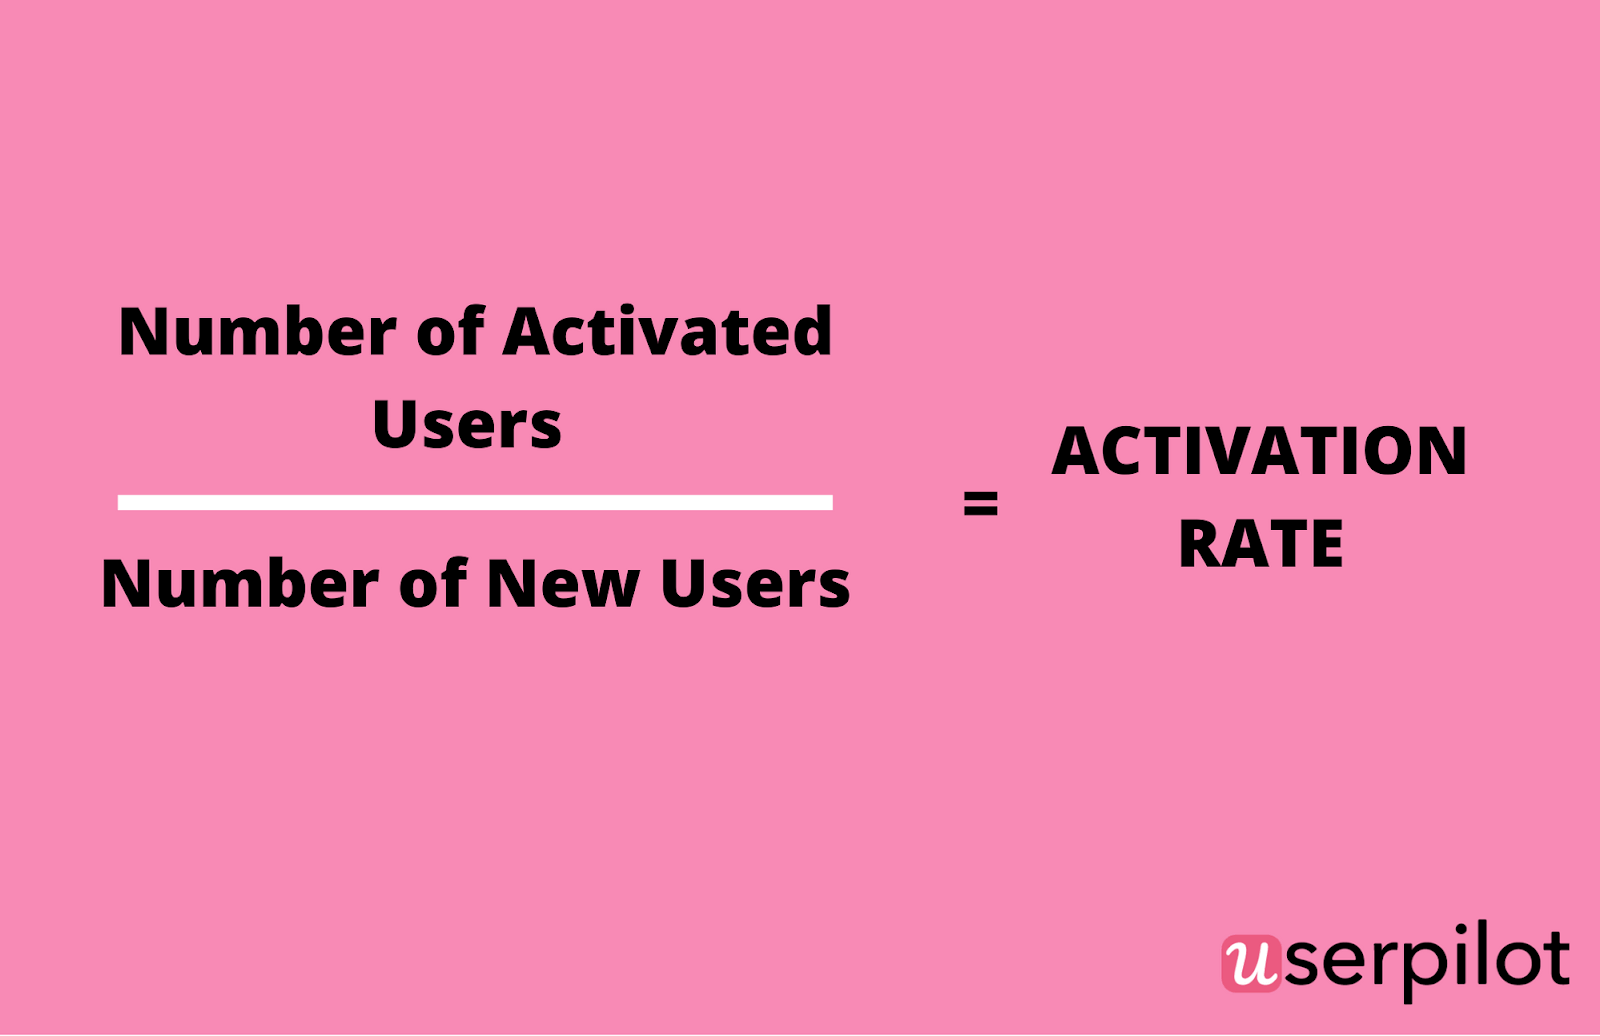 UserPilot activation rate formula